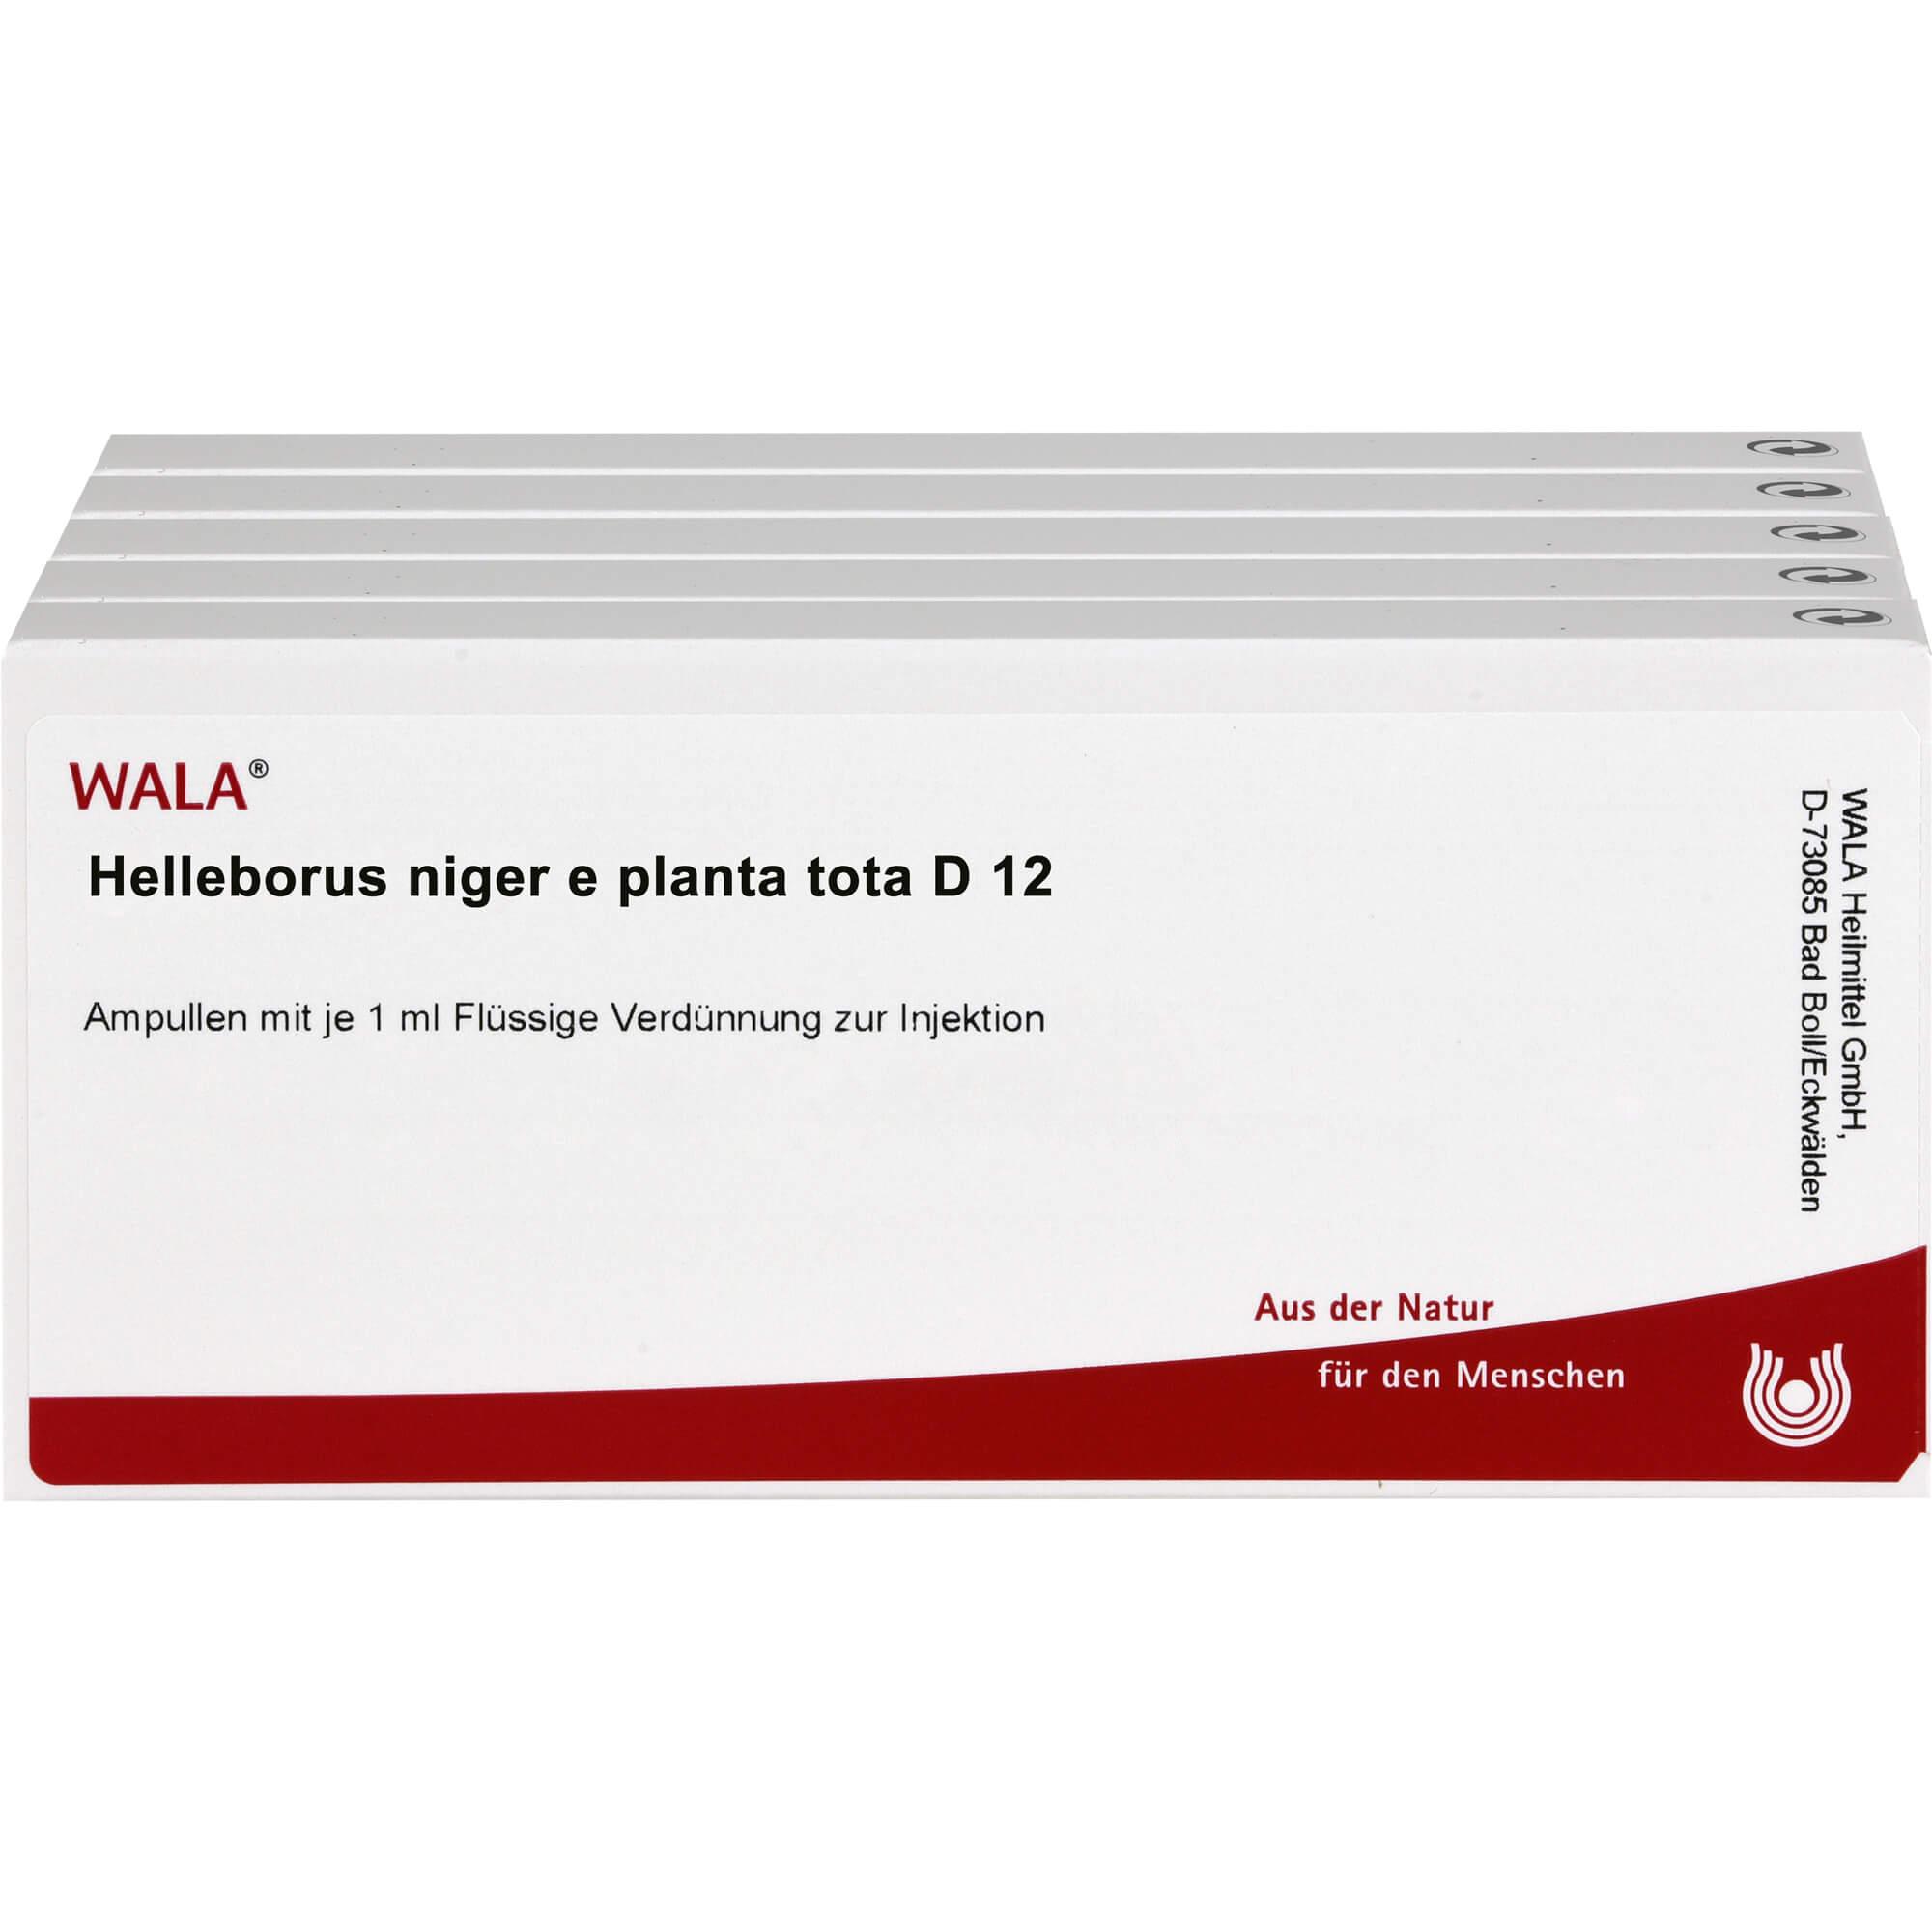 HELLEBORUS NIGER e planta tota D 12 Ampullen